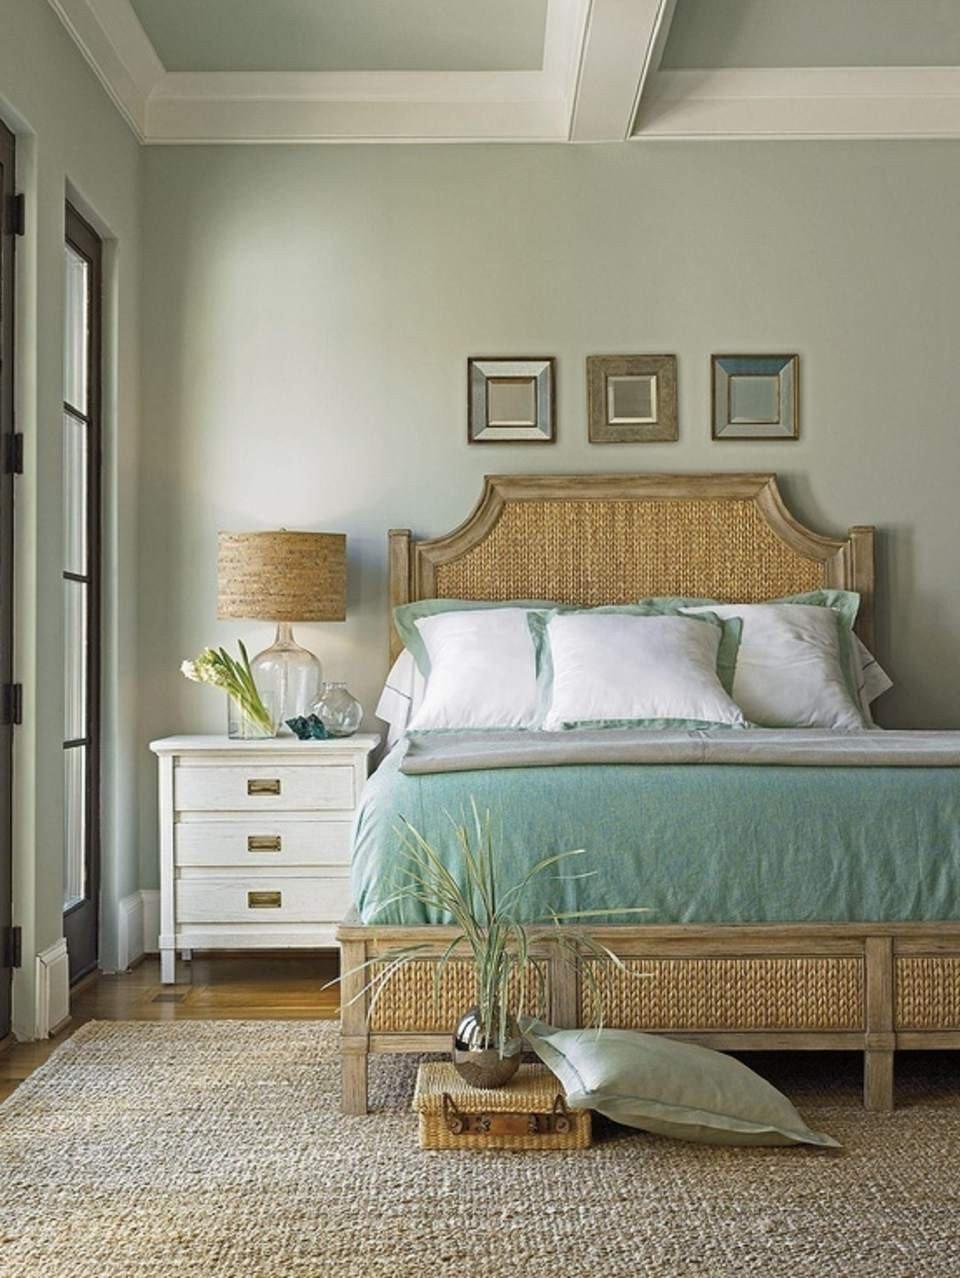 Beach themed Bedroom Accessories Fresh 50 Gorgeous Beach Bedroom Decor Ideas